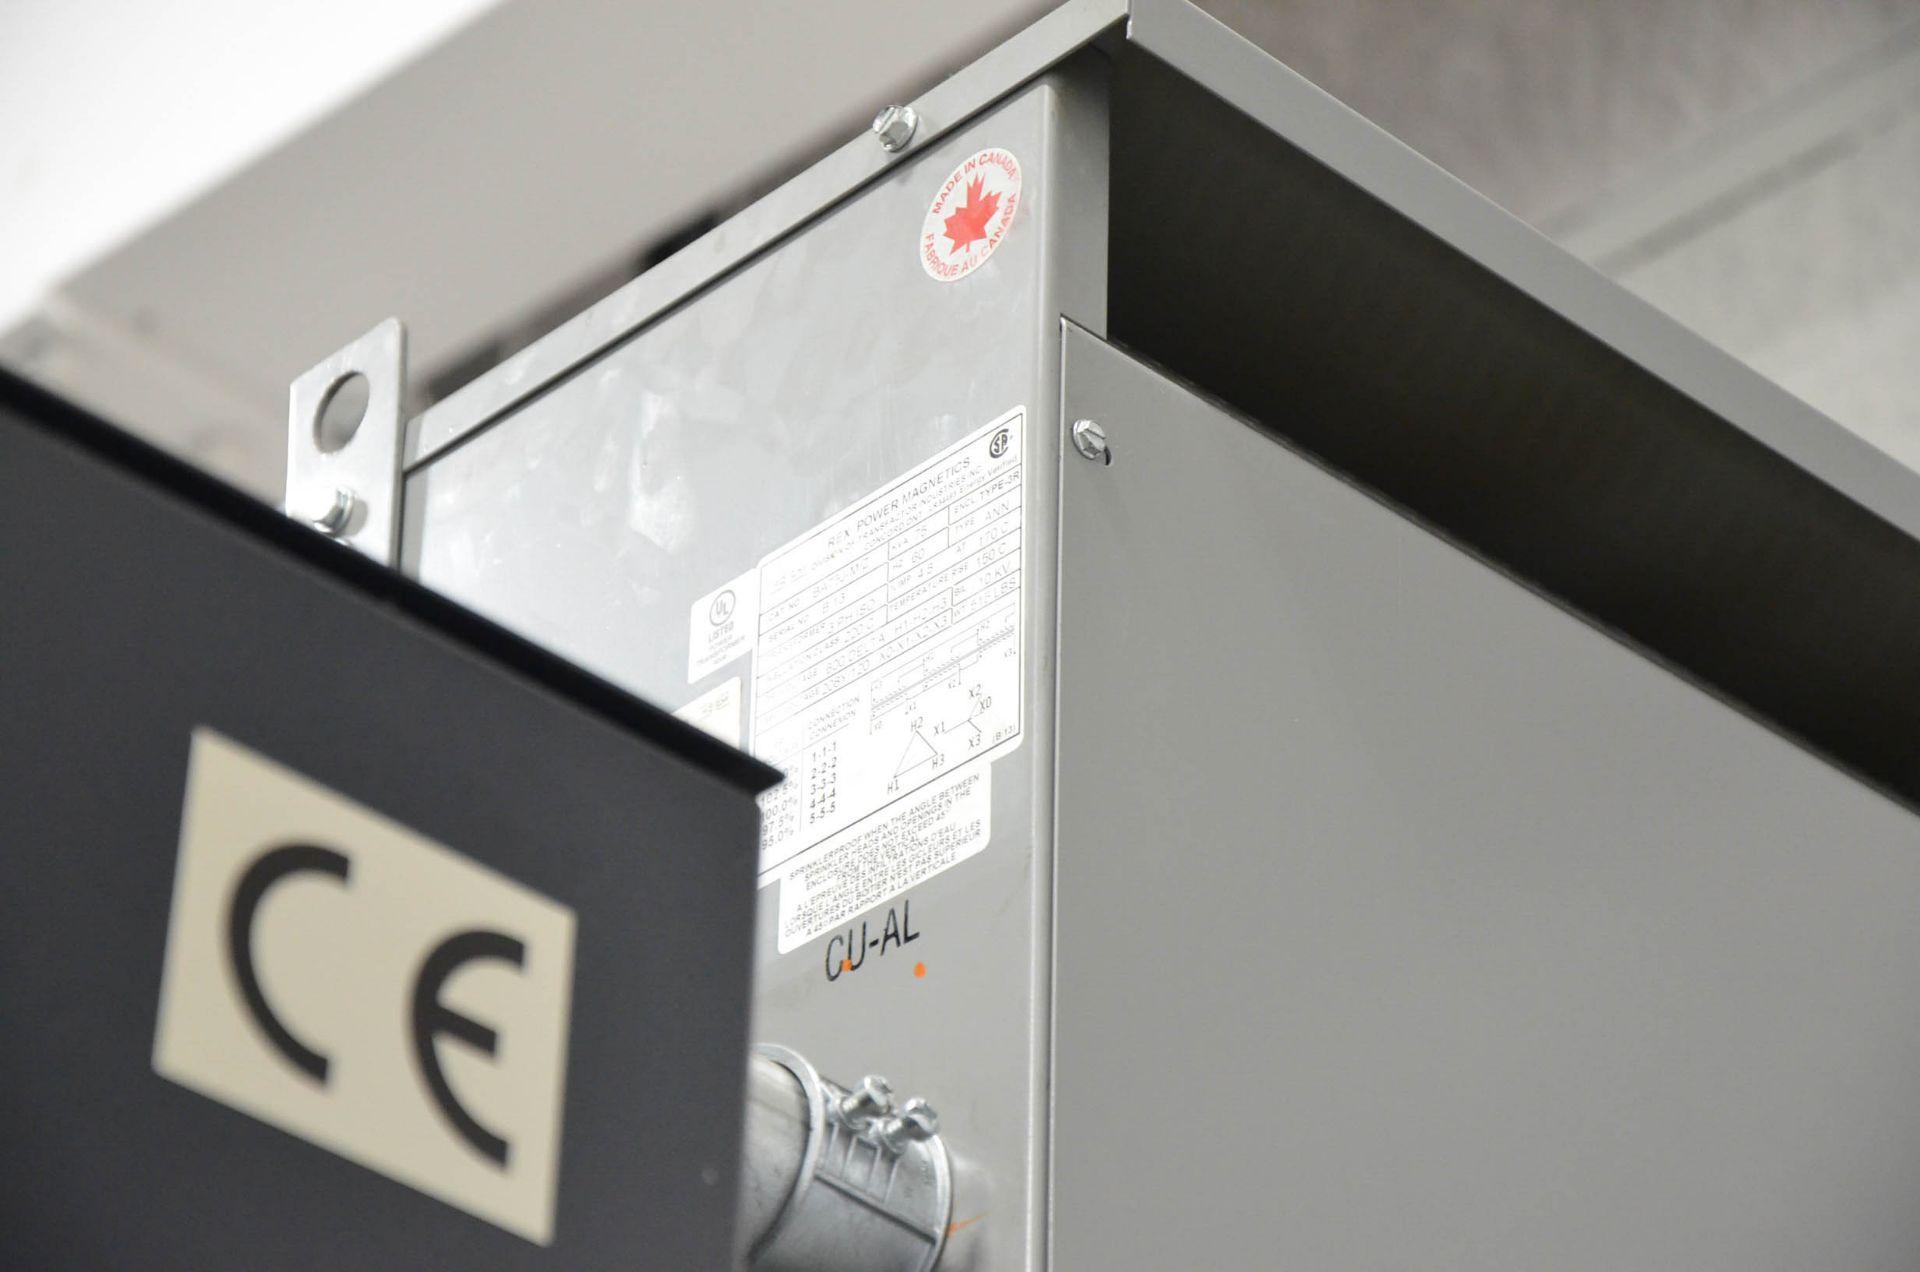 REX 75KVA/600-208-120V/3PH/60HZ TRANSFORMER (CI) [RIGGING FEES FOR LOT #227 - $50 USD PLUS - Image 2 of 2